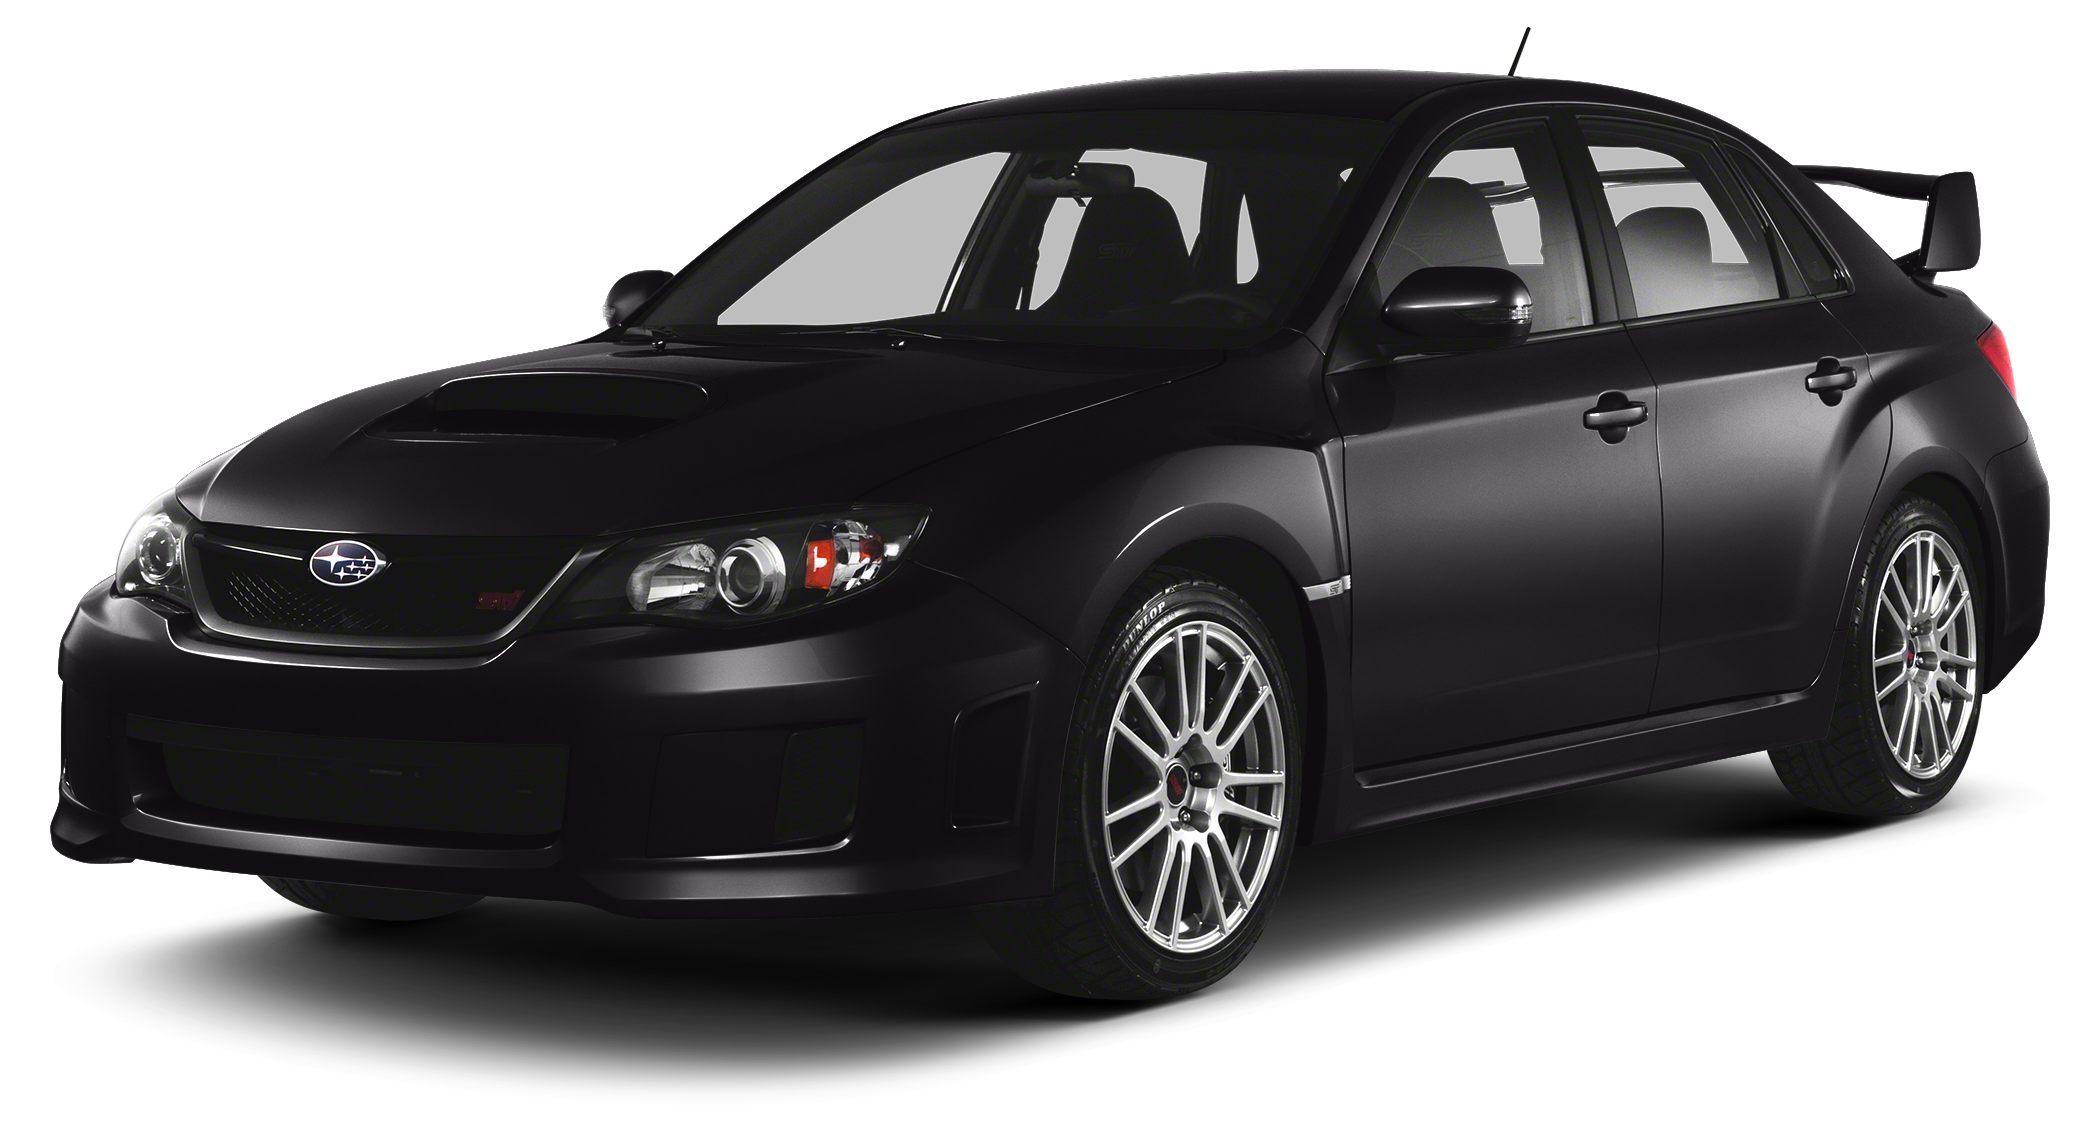 2013 Subaru Impreza WRX STi Limited Miles 18585Color Crystal Black Silica Stock 021820 VIN J